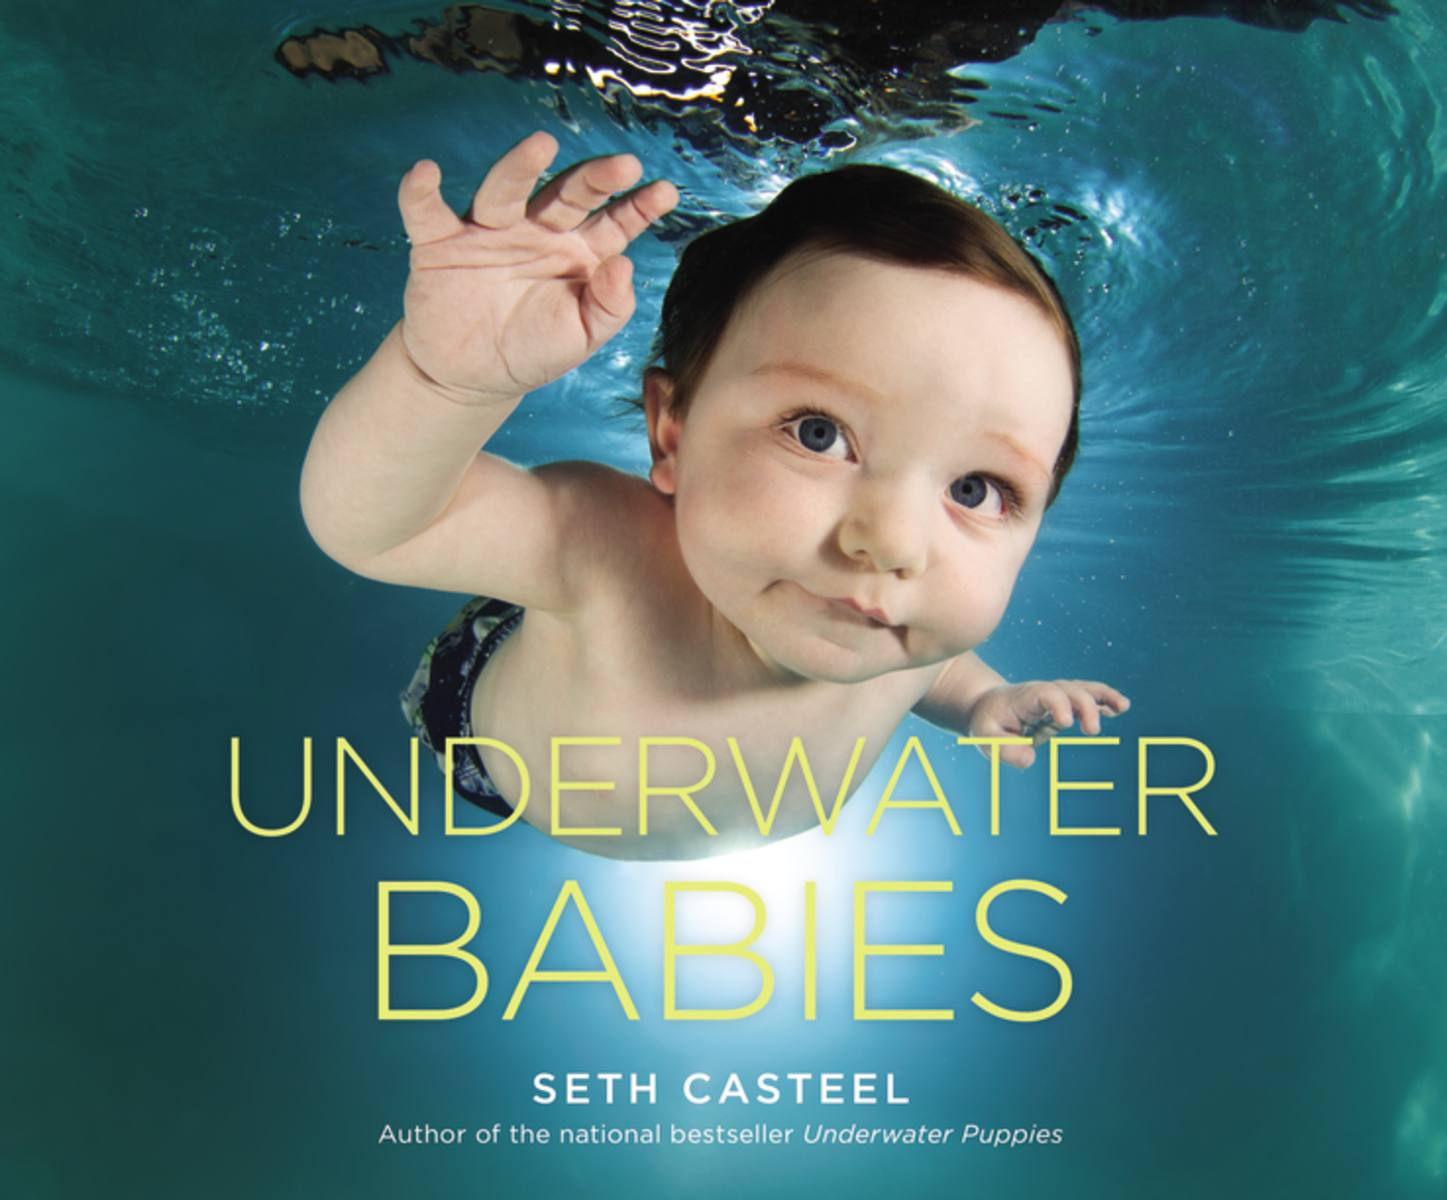 'Underwater Babies' Photographer Seeks to Bring Awareness Through Work